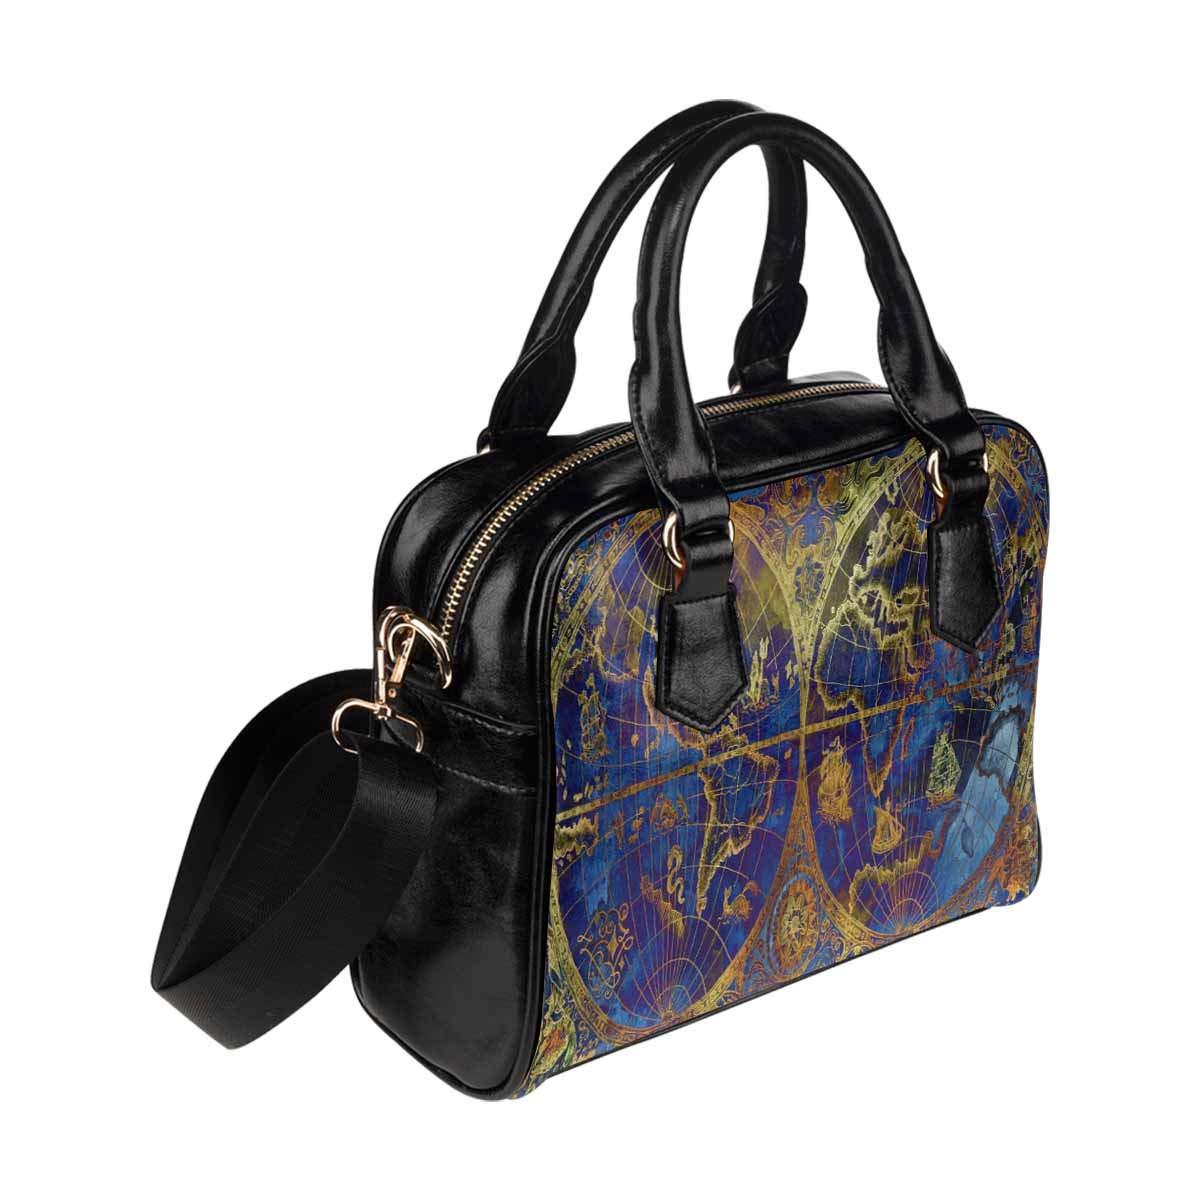 InterestPrint Womens Top Handle PU Leather Shoulder Satchel Bag